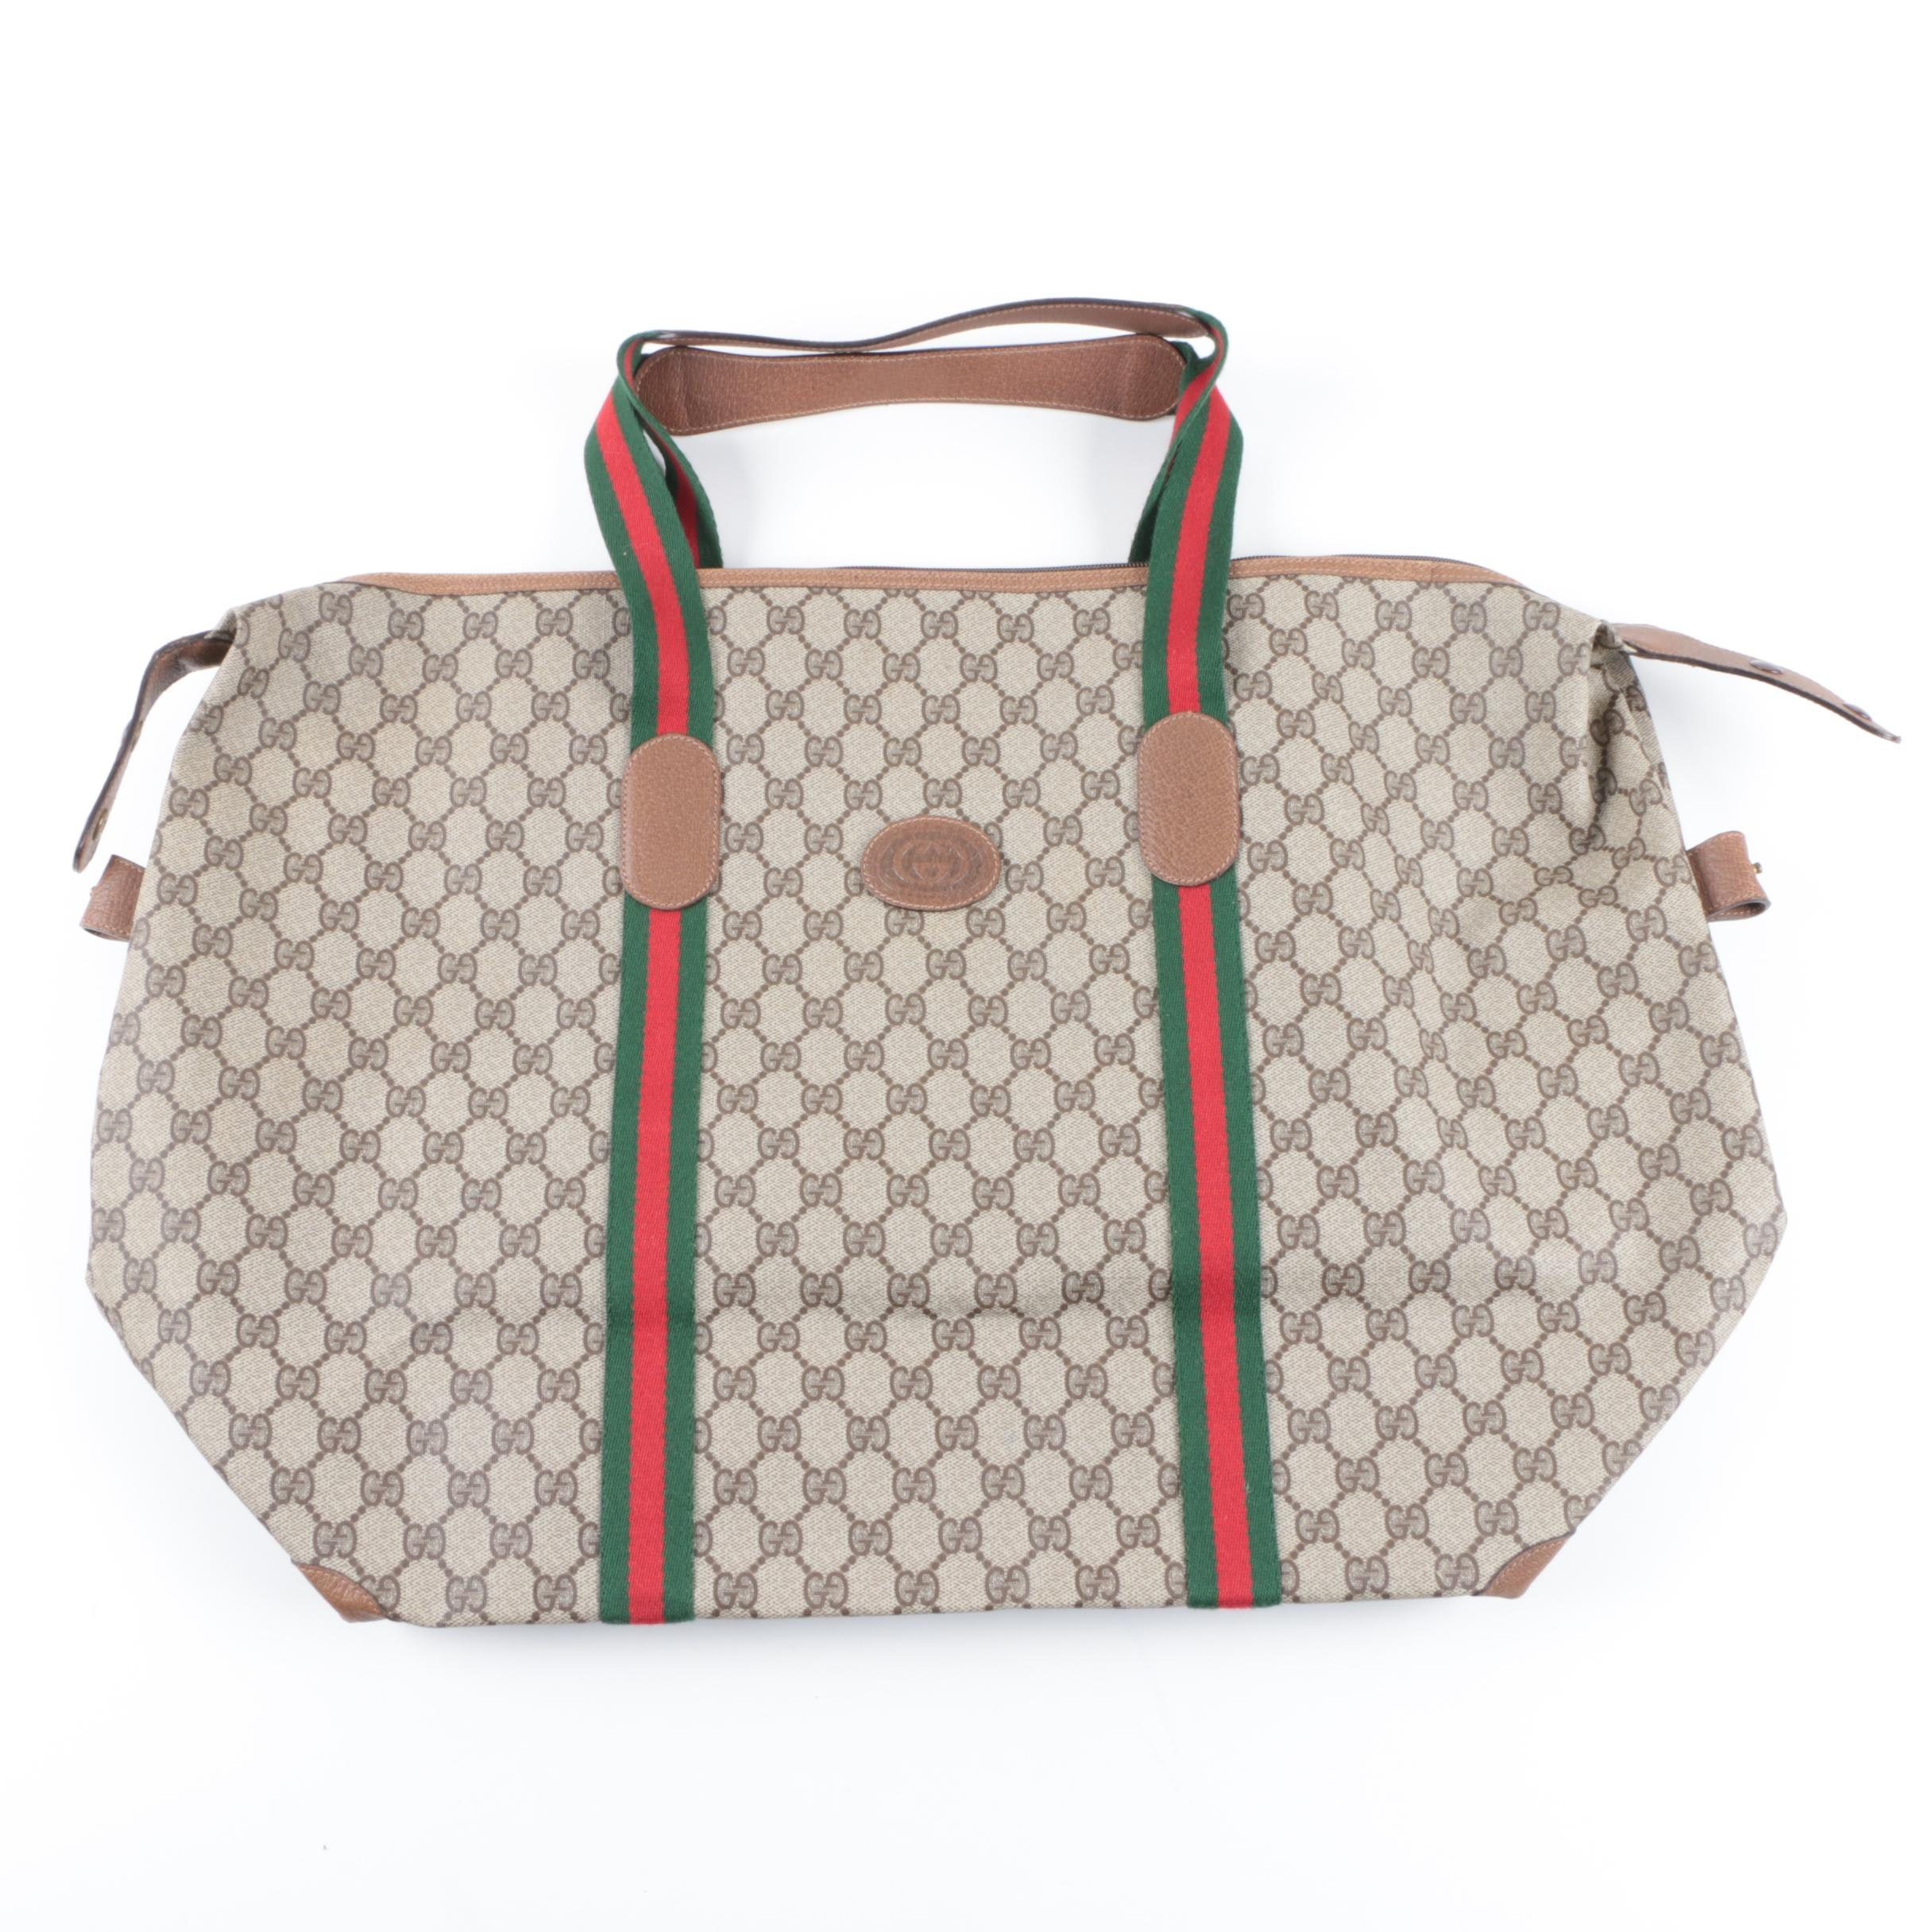 Vintage Gucci Accessory Collection Supreme GG Tote Bag